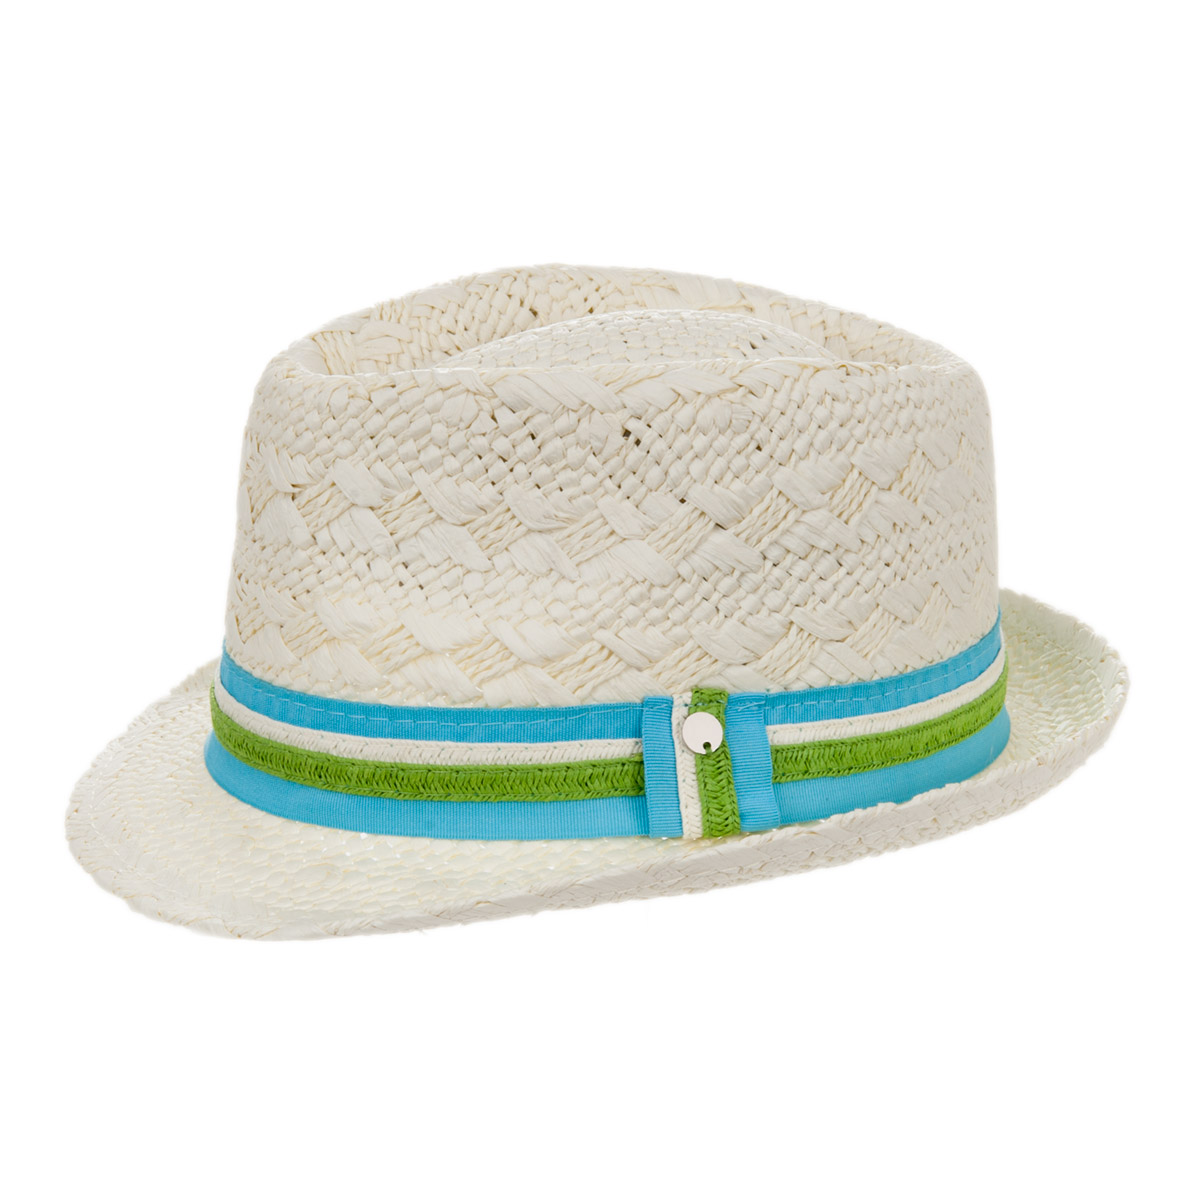 cappello trilby estivo bianco ... 6efc94152d55